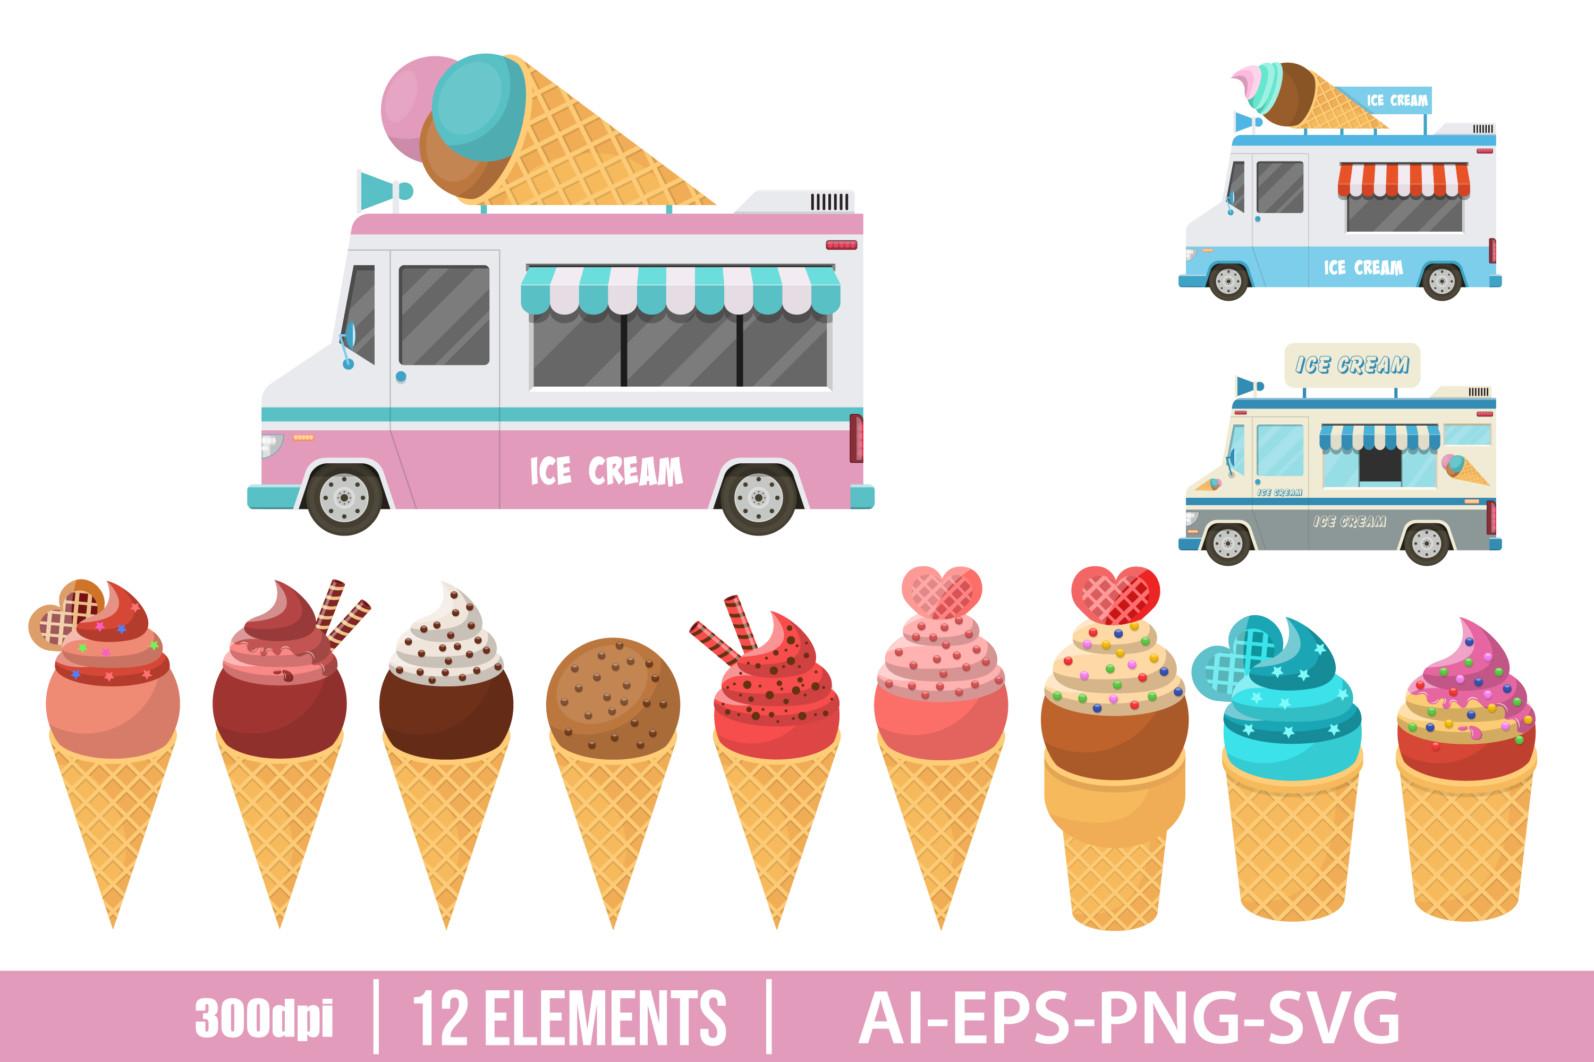 Cone ice cream and ice cream car clipart vector design illustration. Vector Clipart Print - ICE CREAM ELEMENTS scaled -